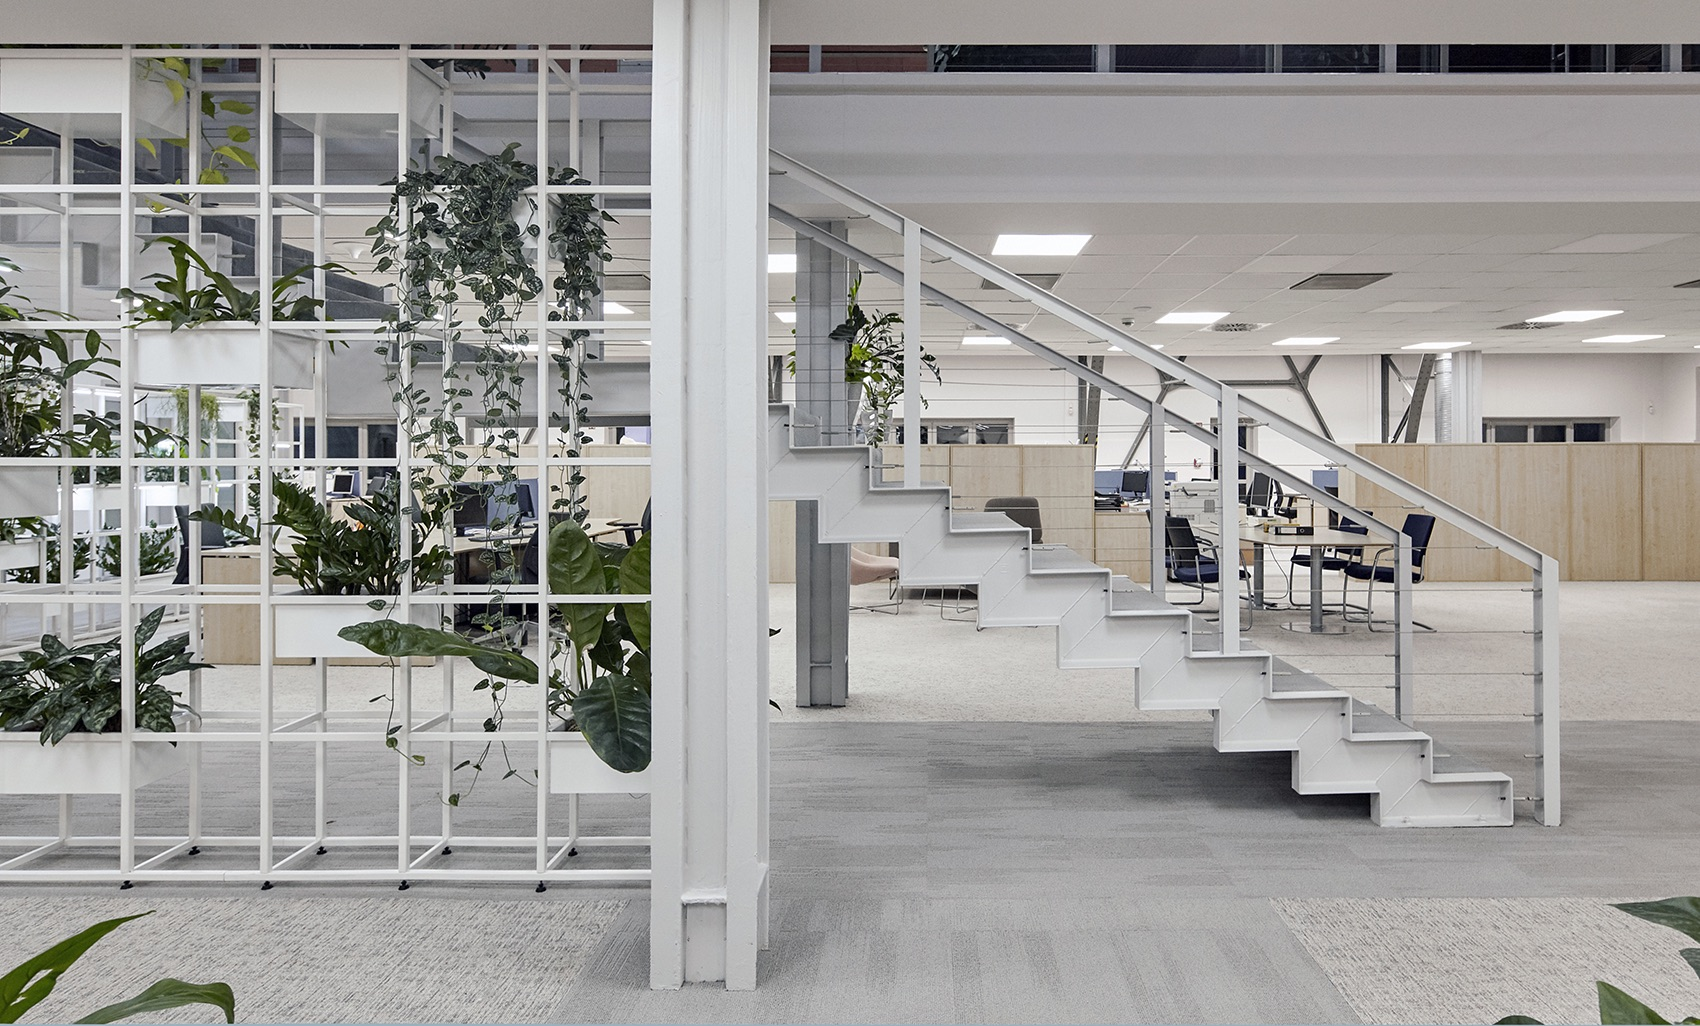 wing-zrt-office-8